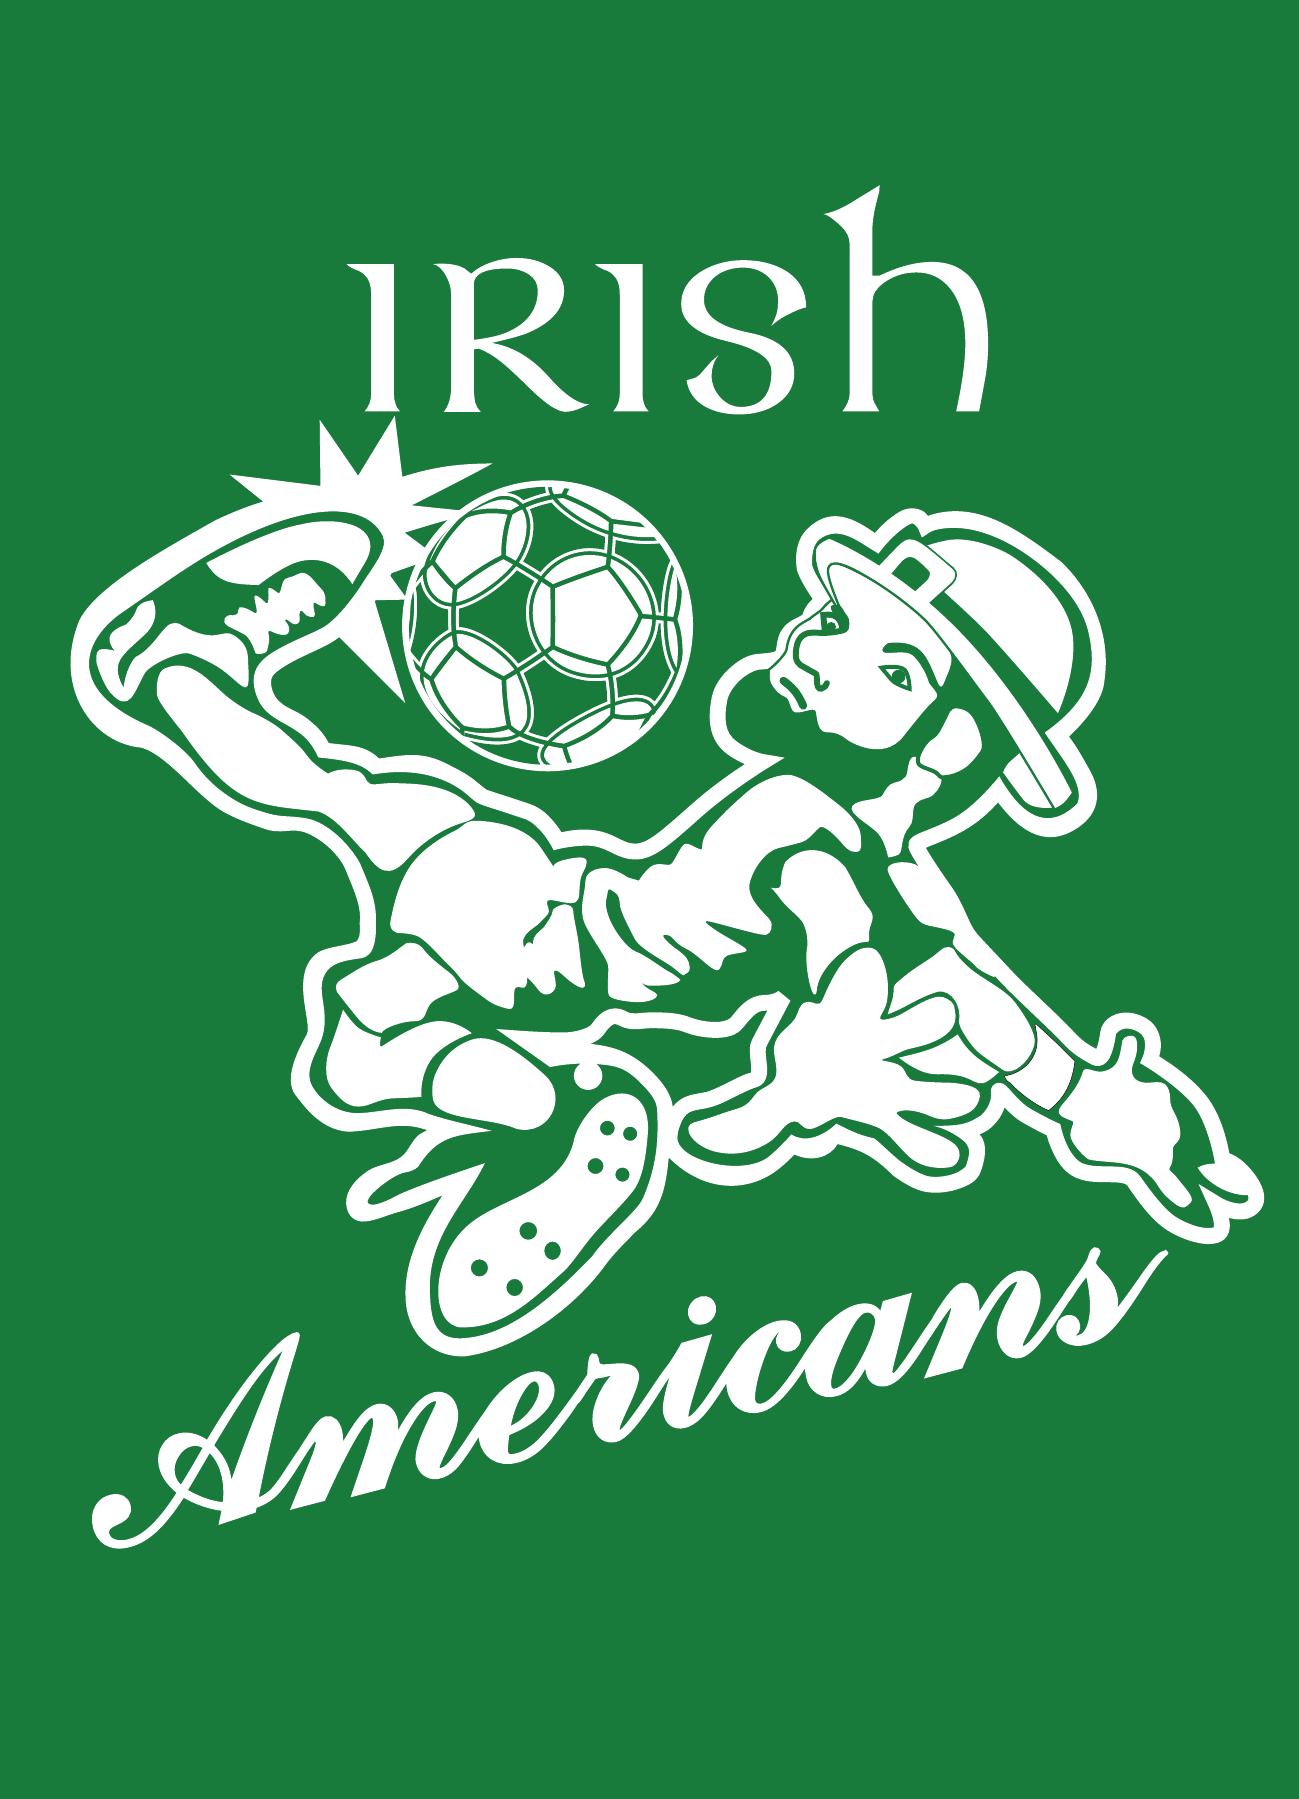 Irish Americans